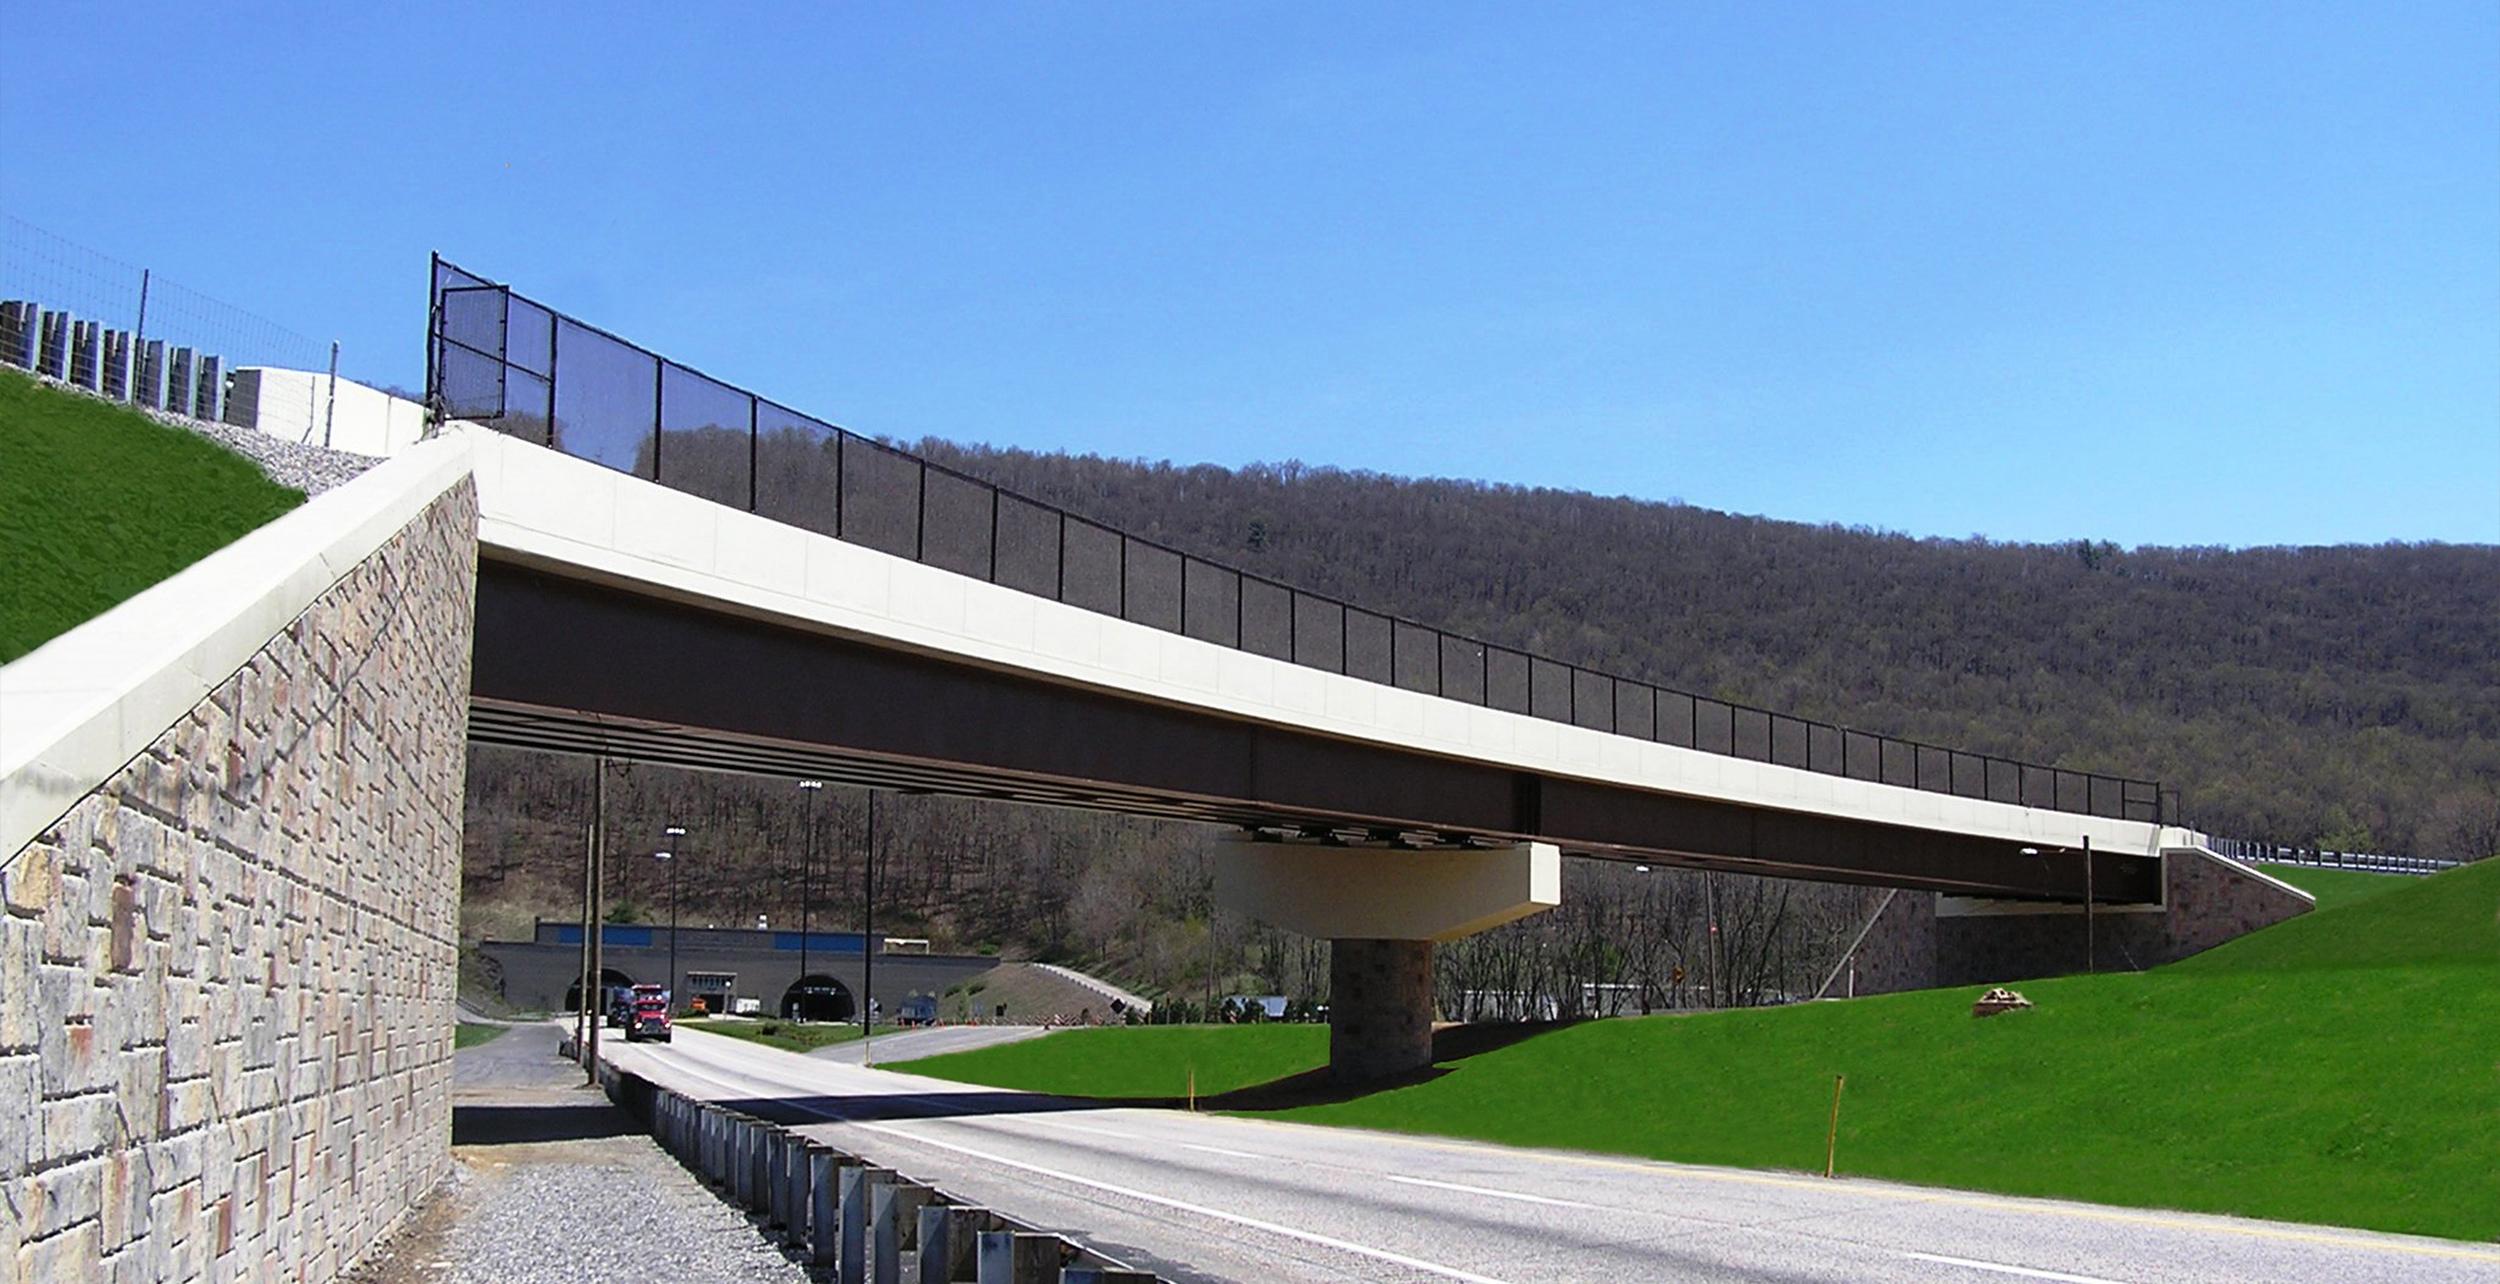 Bridge Nos. B-465A & B-465 at Mileposts 197.19 & 197.20